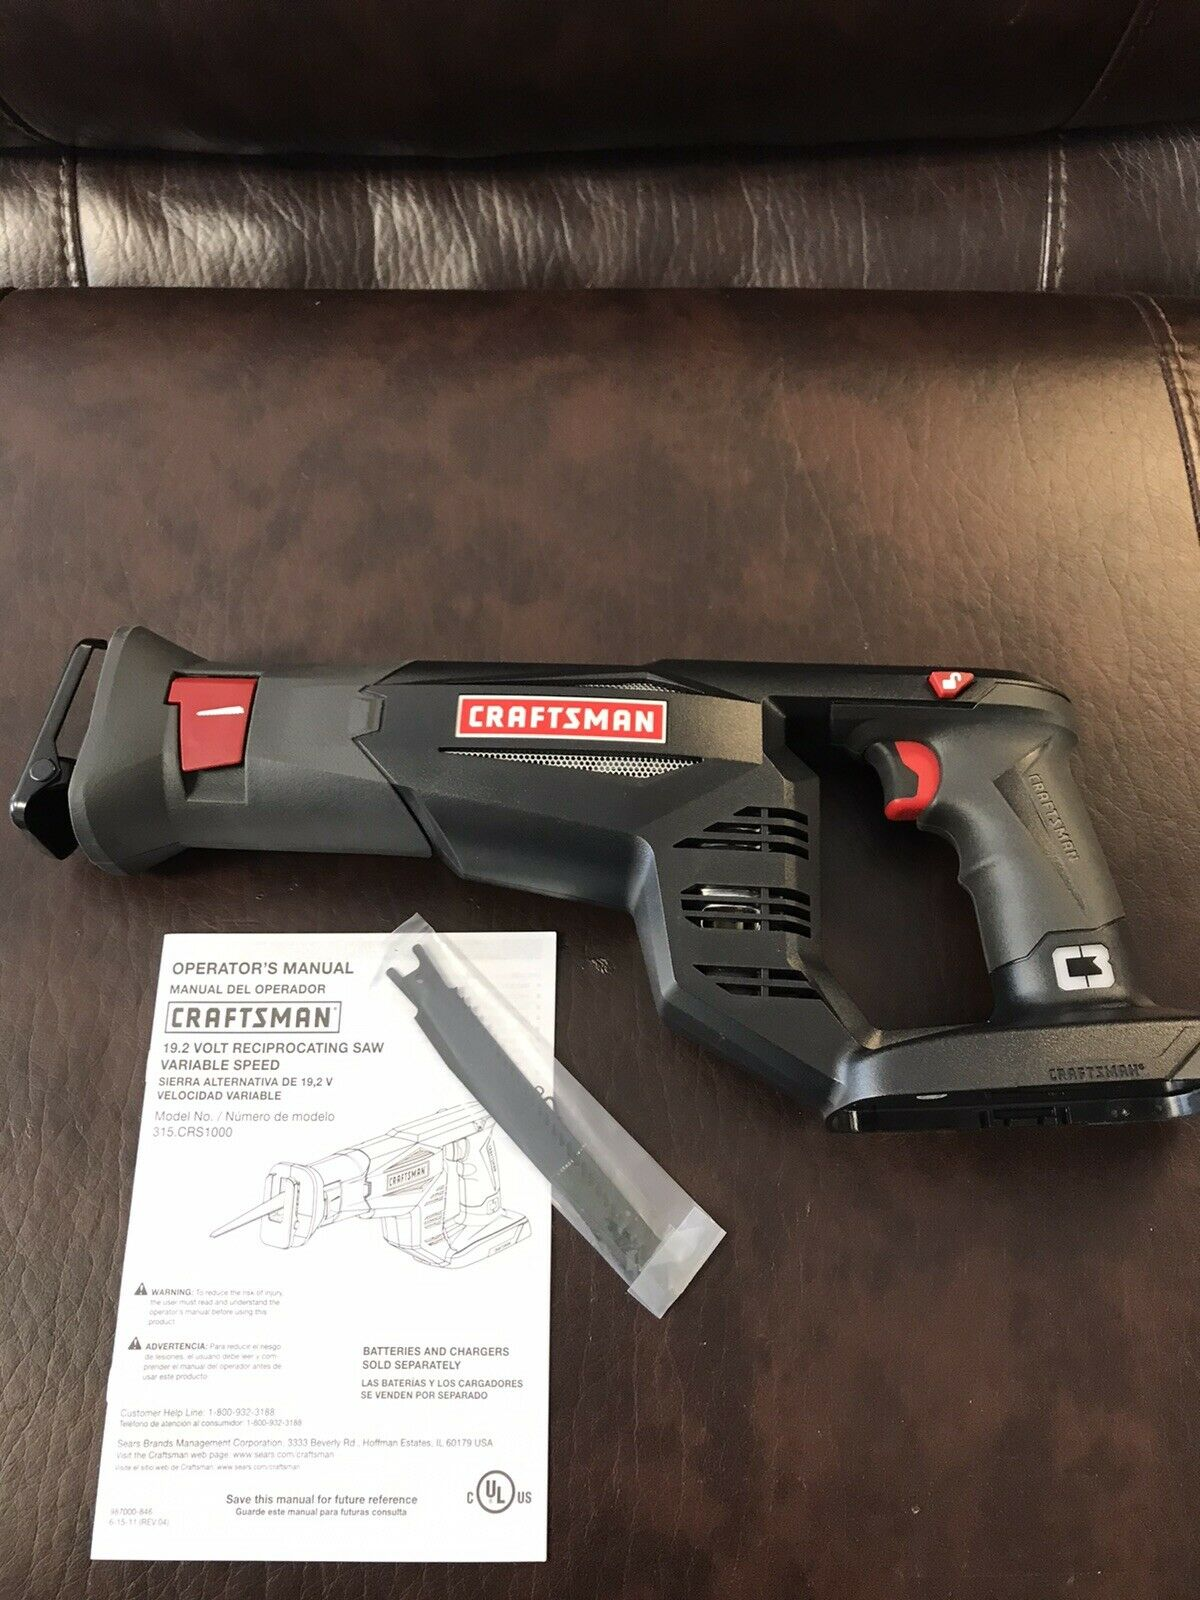 NEW Craftsman C3 19.2v Volt Reciprocating Saw Varible Speed